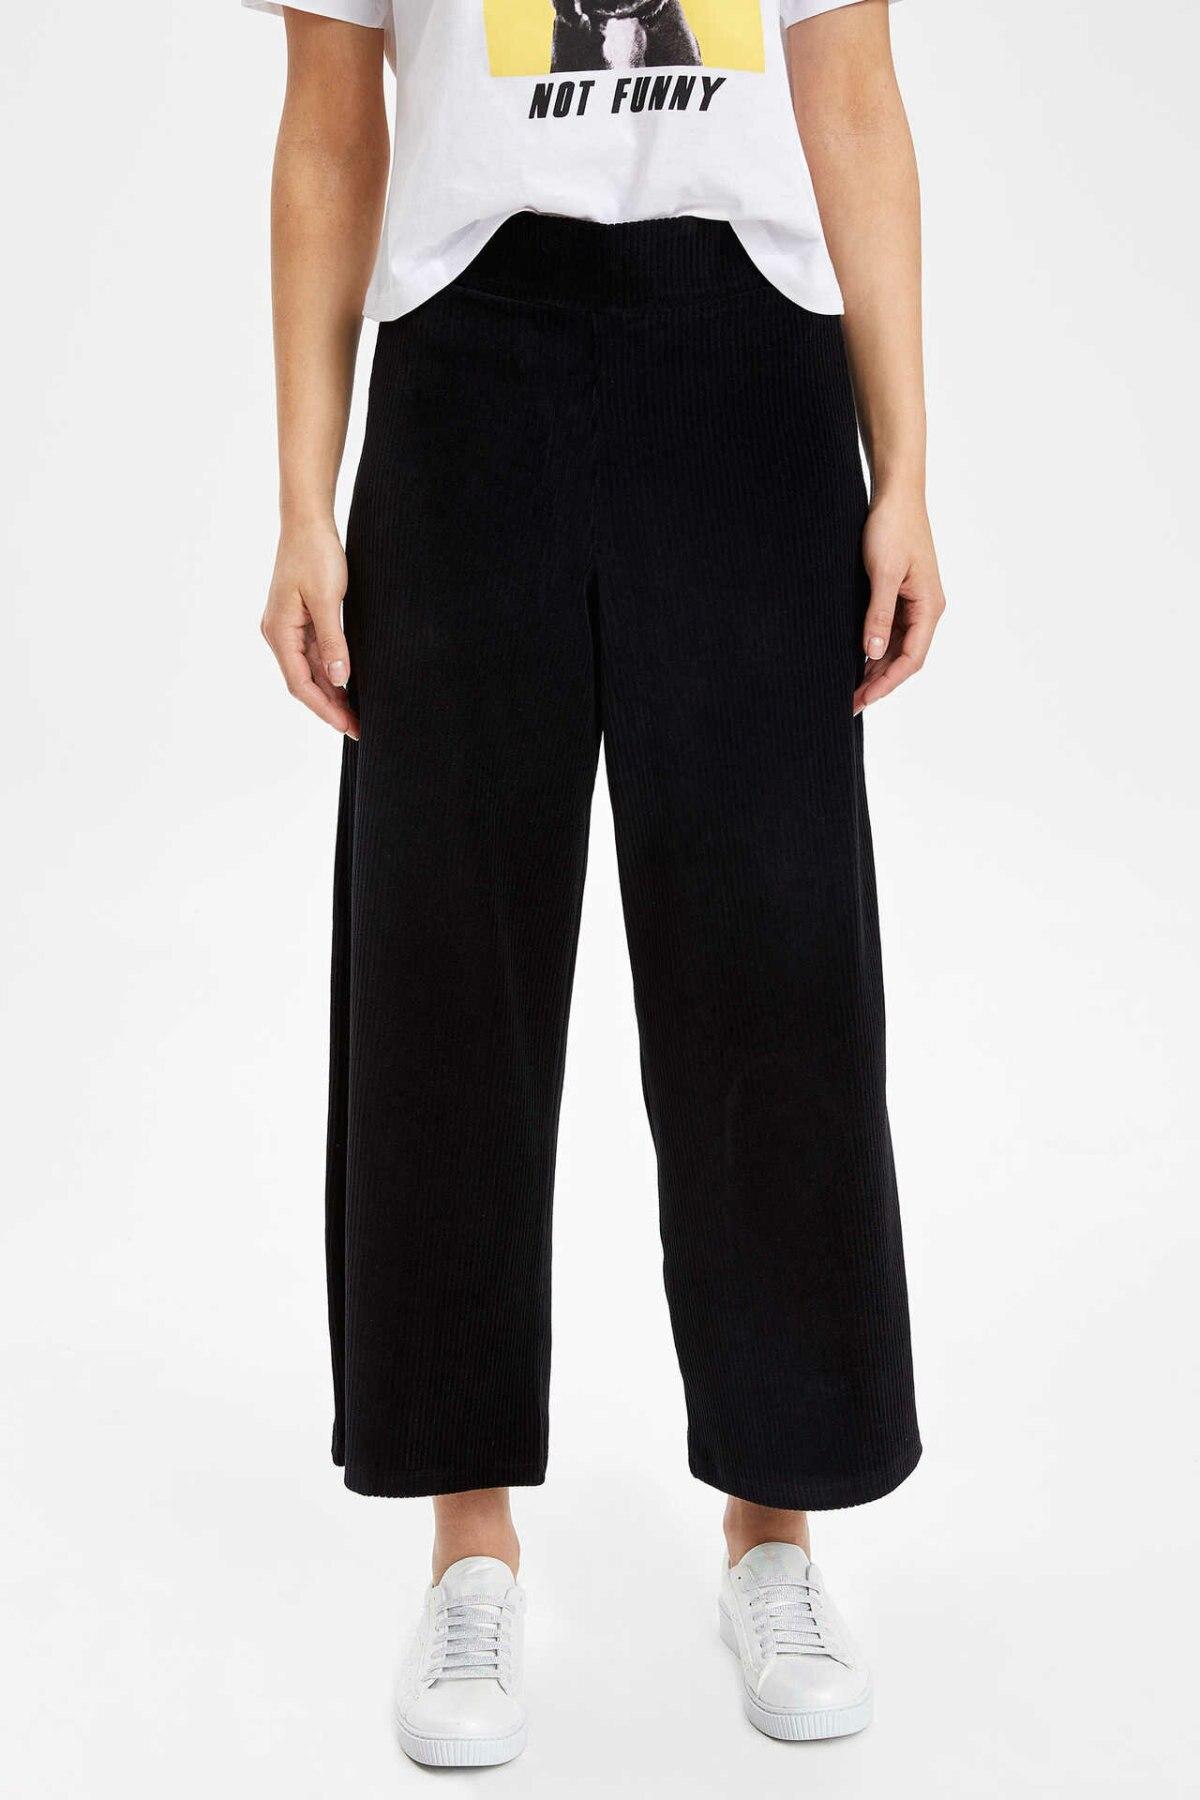 DeFacto Woman Spring Loose Black Pants Women Casual Wide-leg Ninth Pants Female Elastic Bottom Trousers-K6278AZ19SP